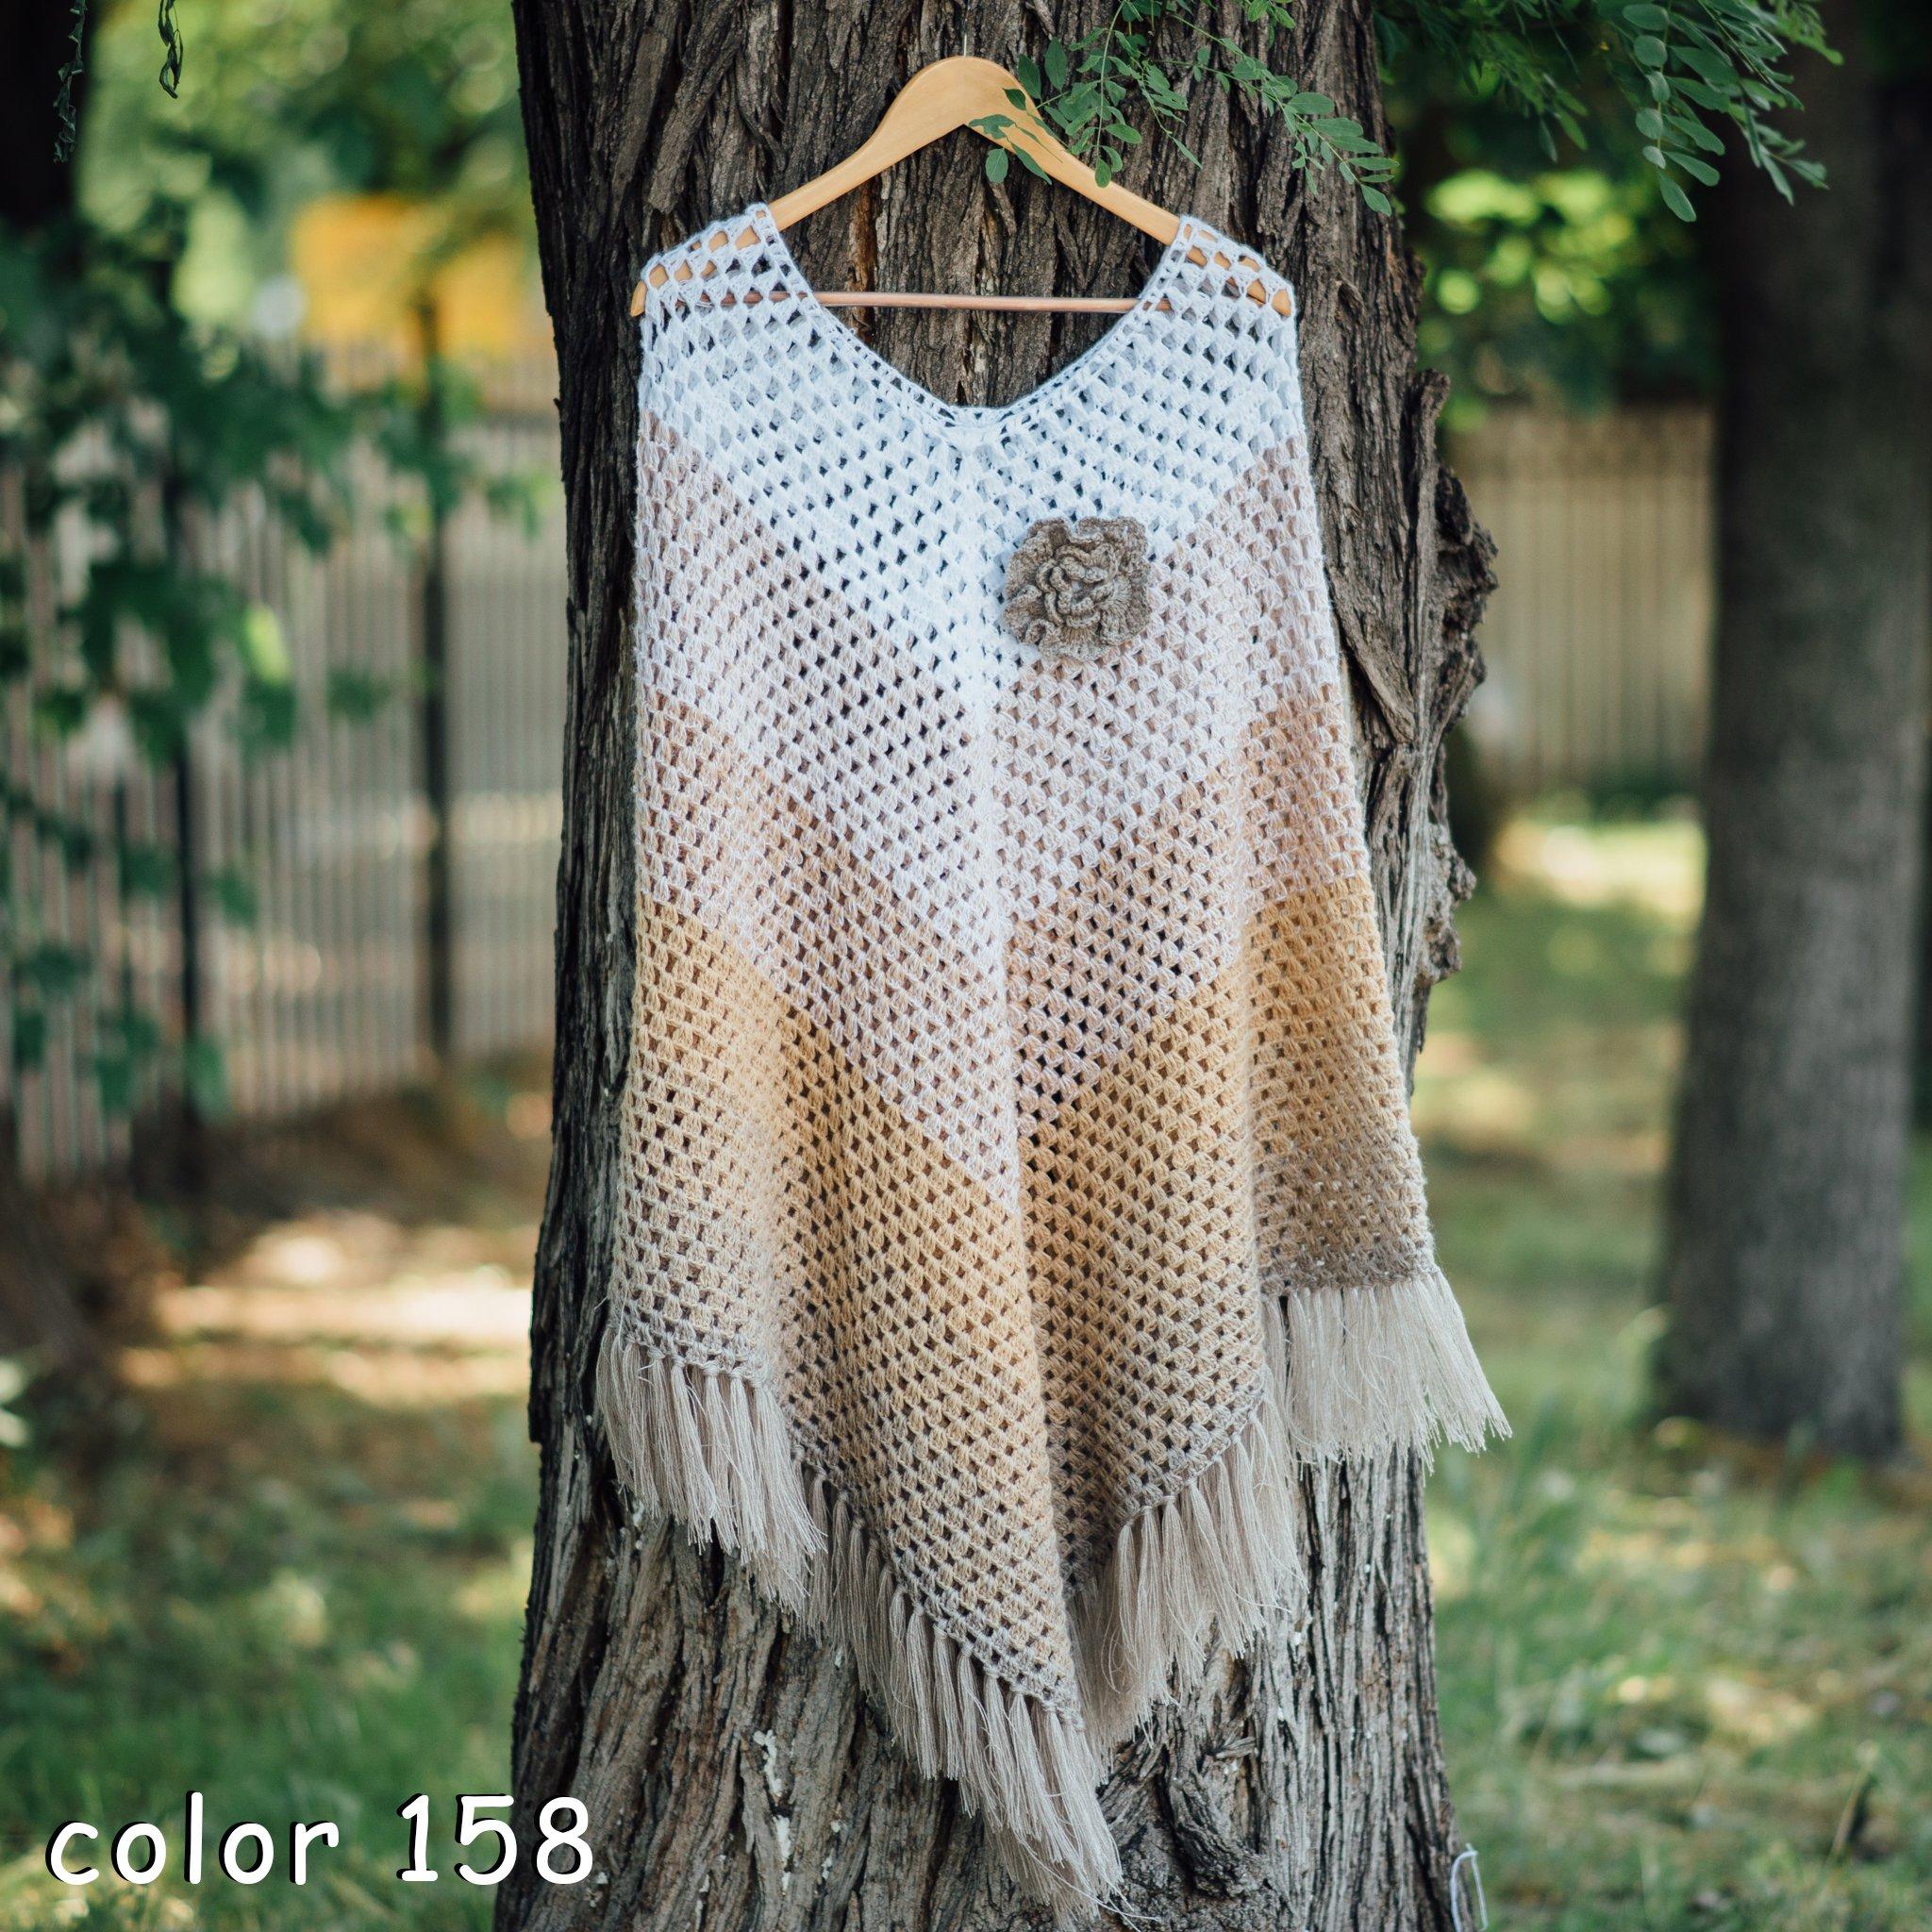 ZuzuHobby Gradient Acrylic Yarn Cake, Big roll, Ombre Effect, Hand Knitting, Crocheting, Knitting Yarn for Machine Knitting, Multicolor, 1, 15 Ounces / 2187 Yards (126)